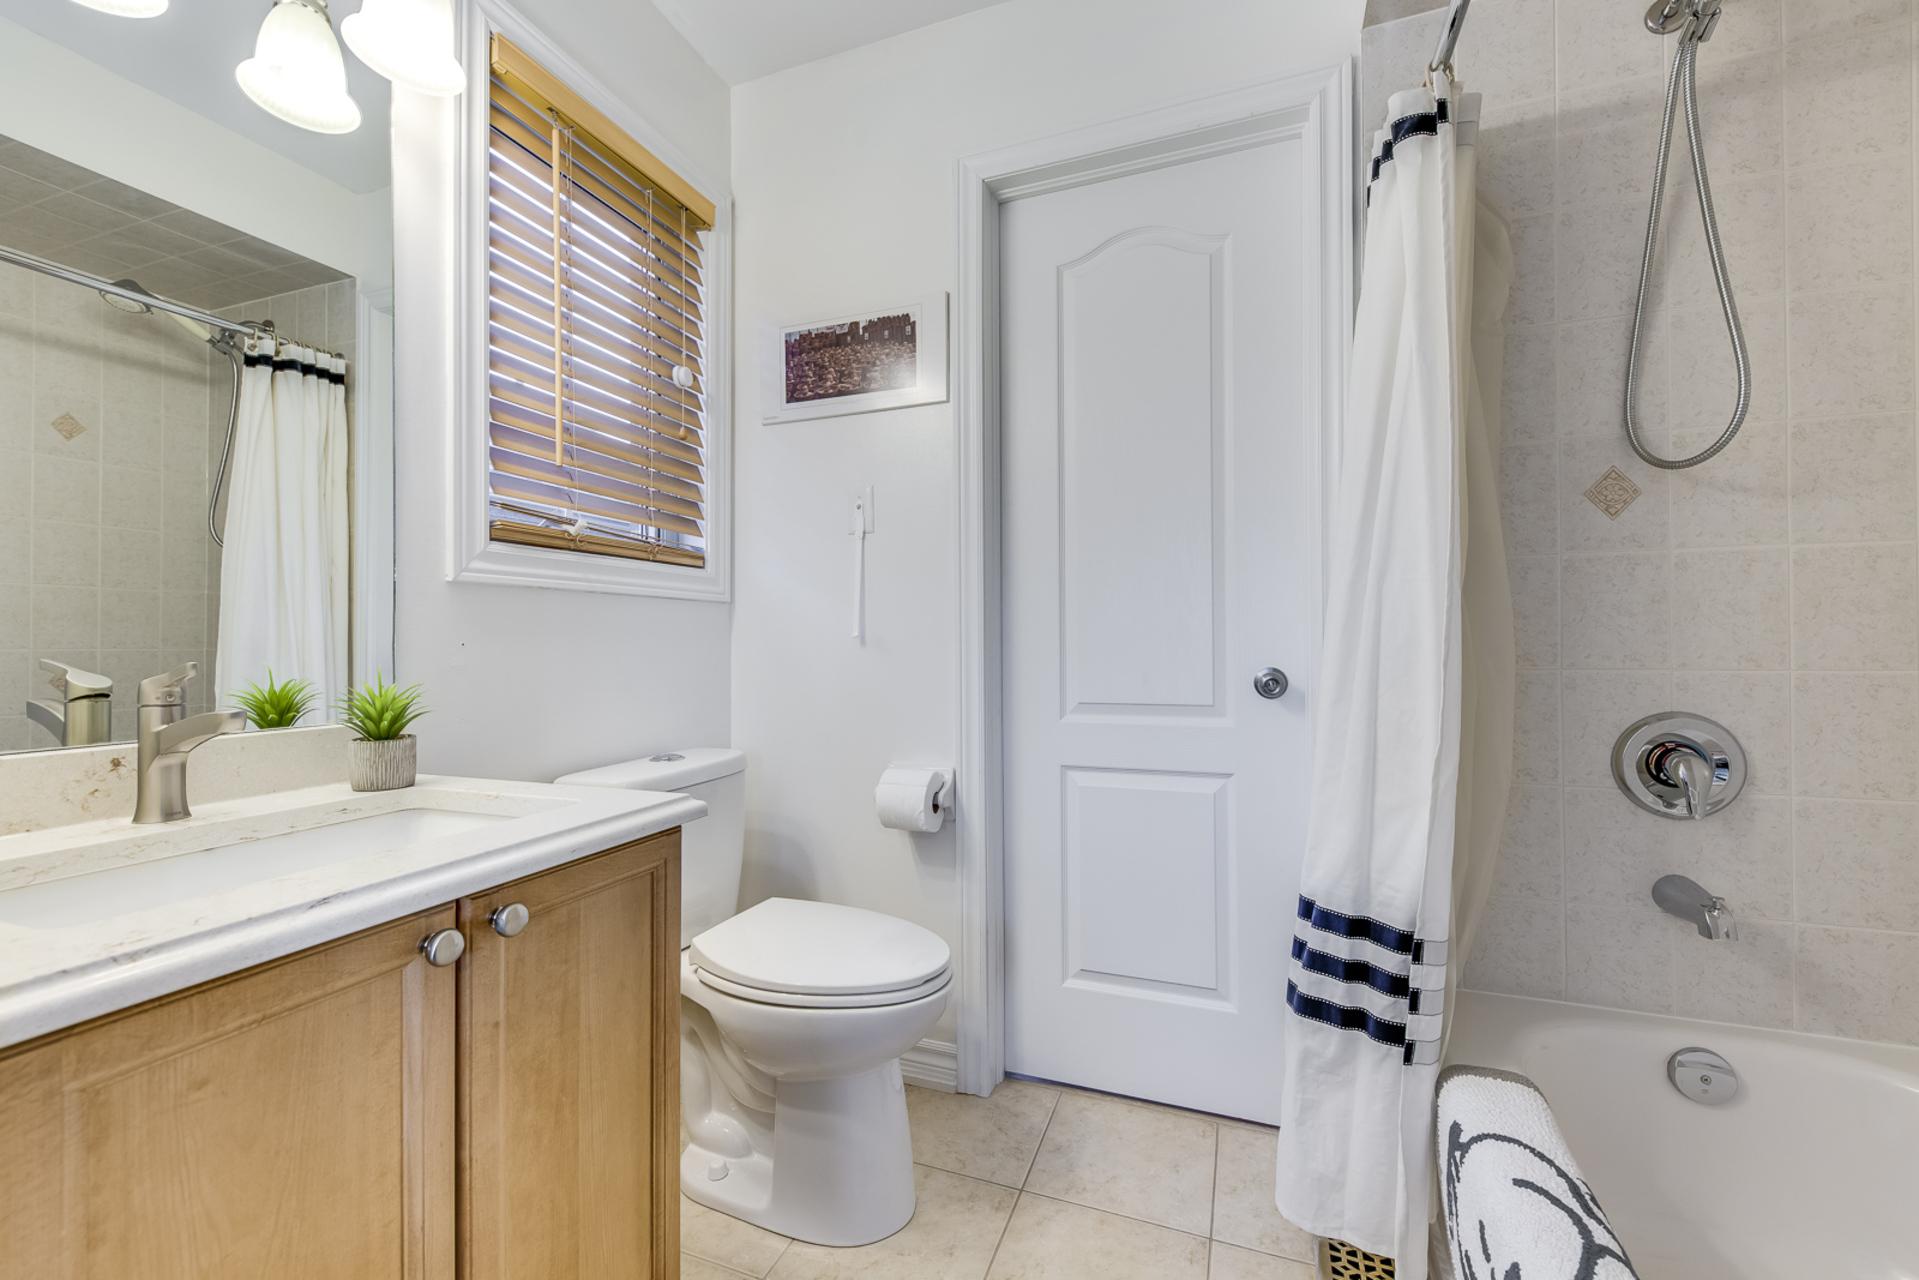 Jack & Jill Washroom - 2395 Tesla Crescent, Oakville - Elite3 & Team at 2395 Tesla Crescent, Iroquois Ridge North, Oakville